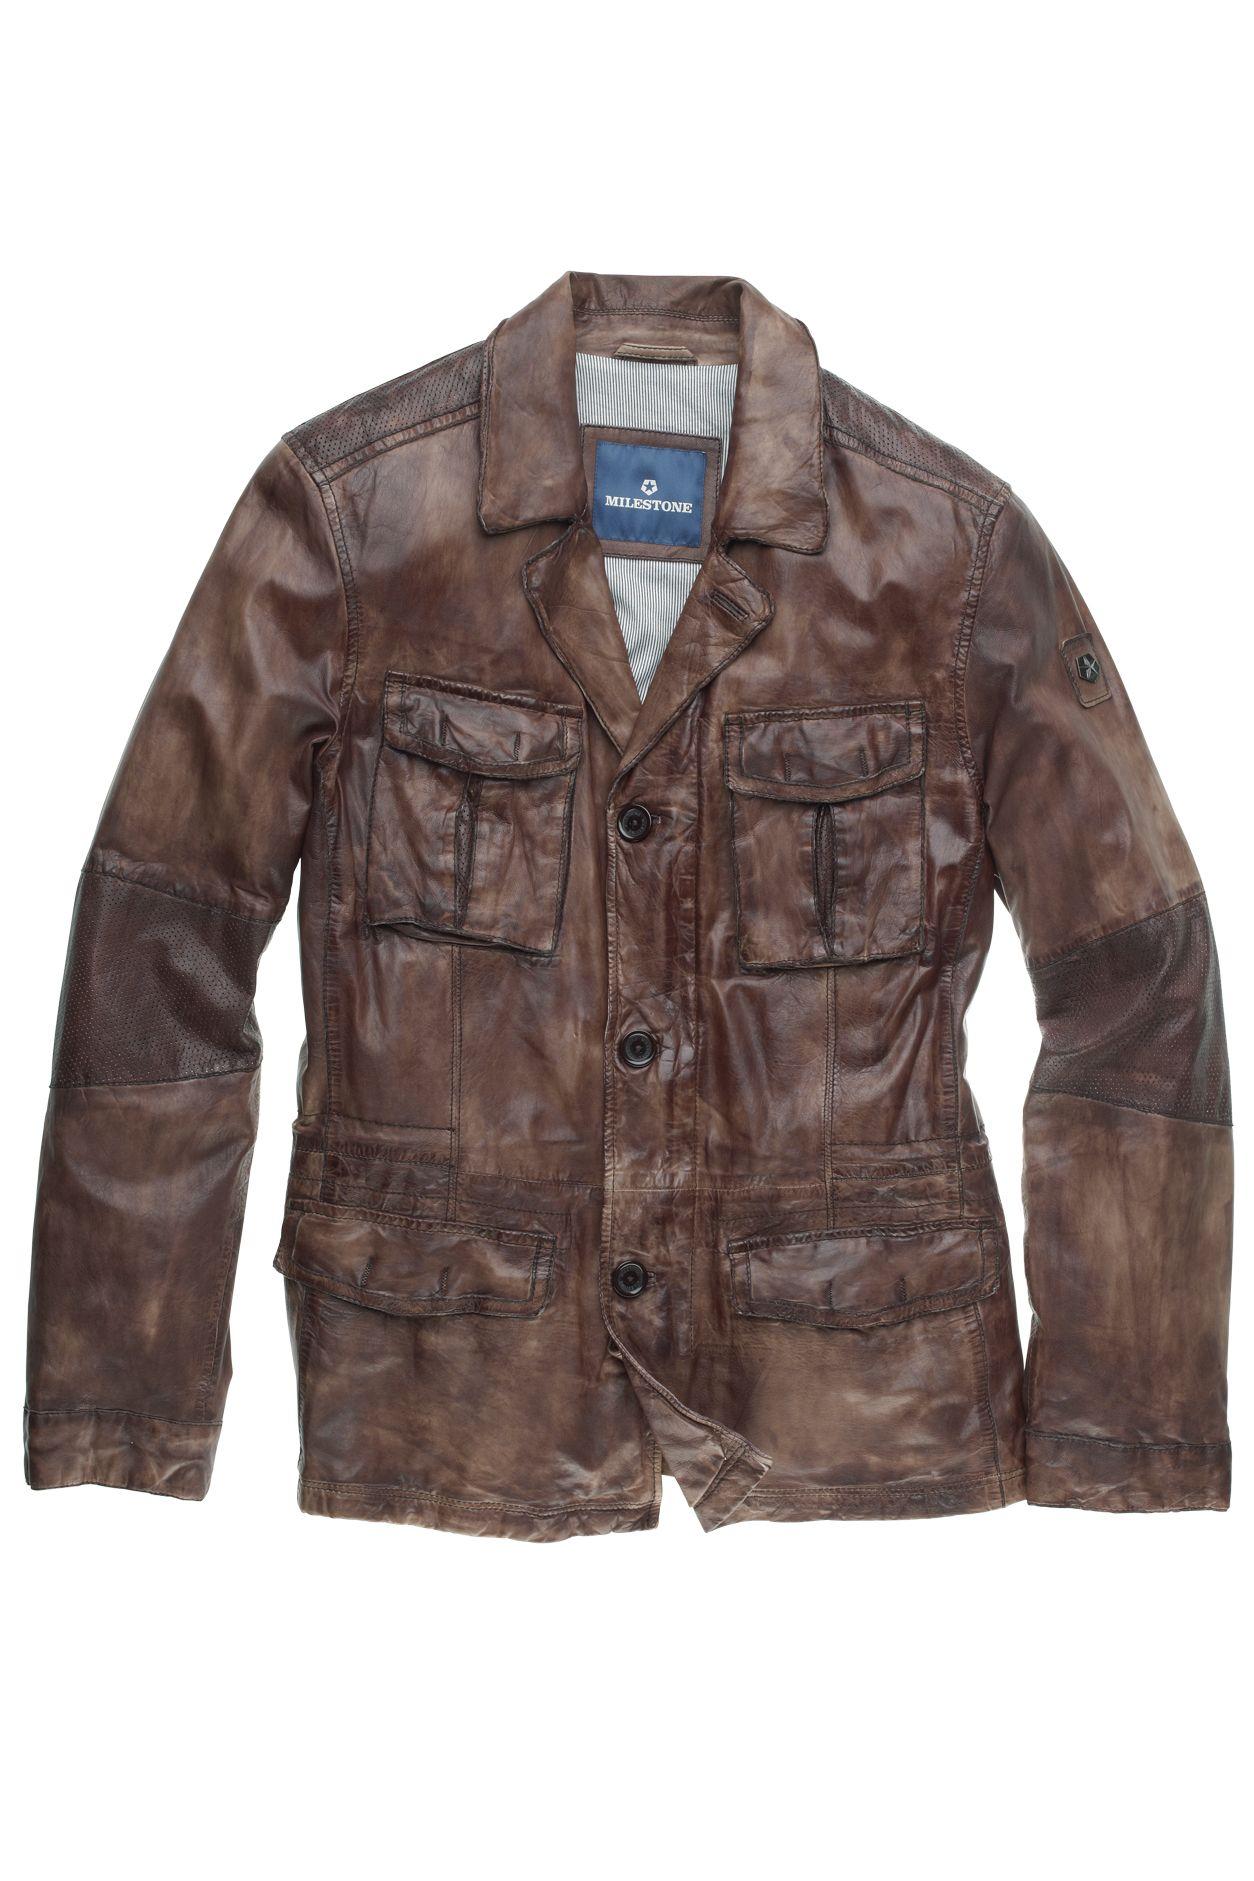 Milestone. The Jacket Brand. Jackets, Jacket brands